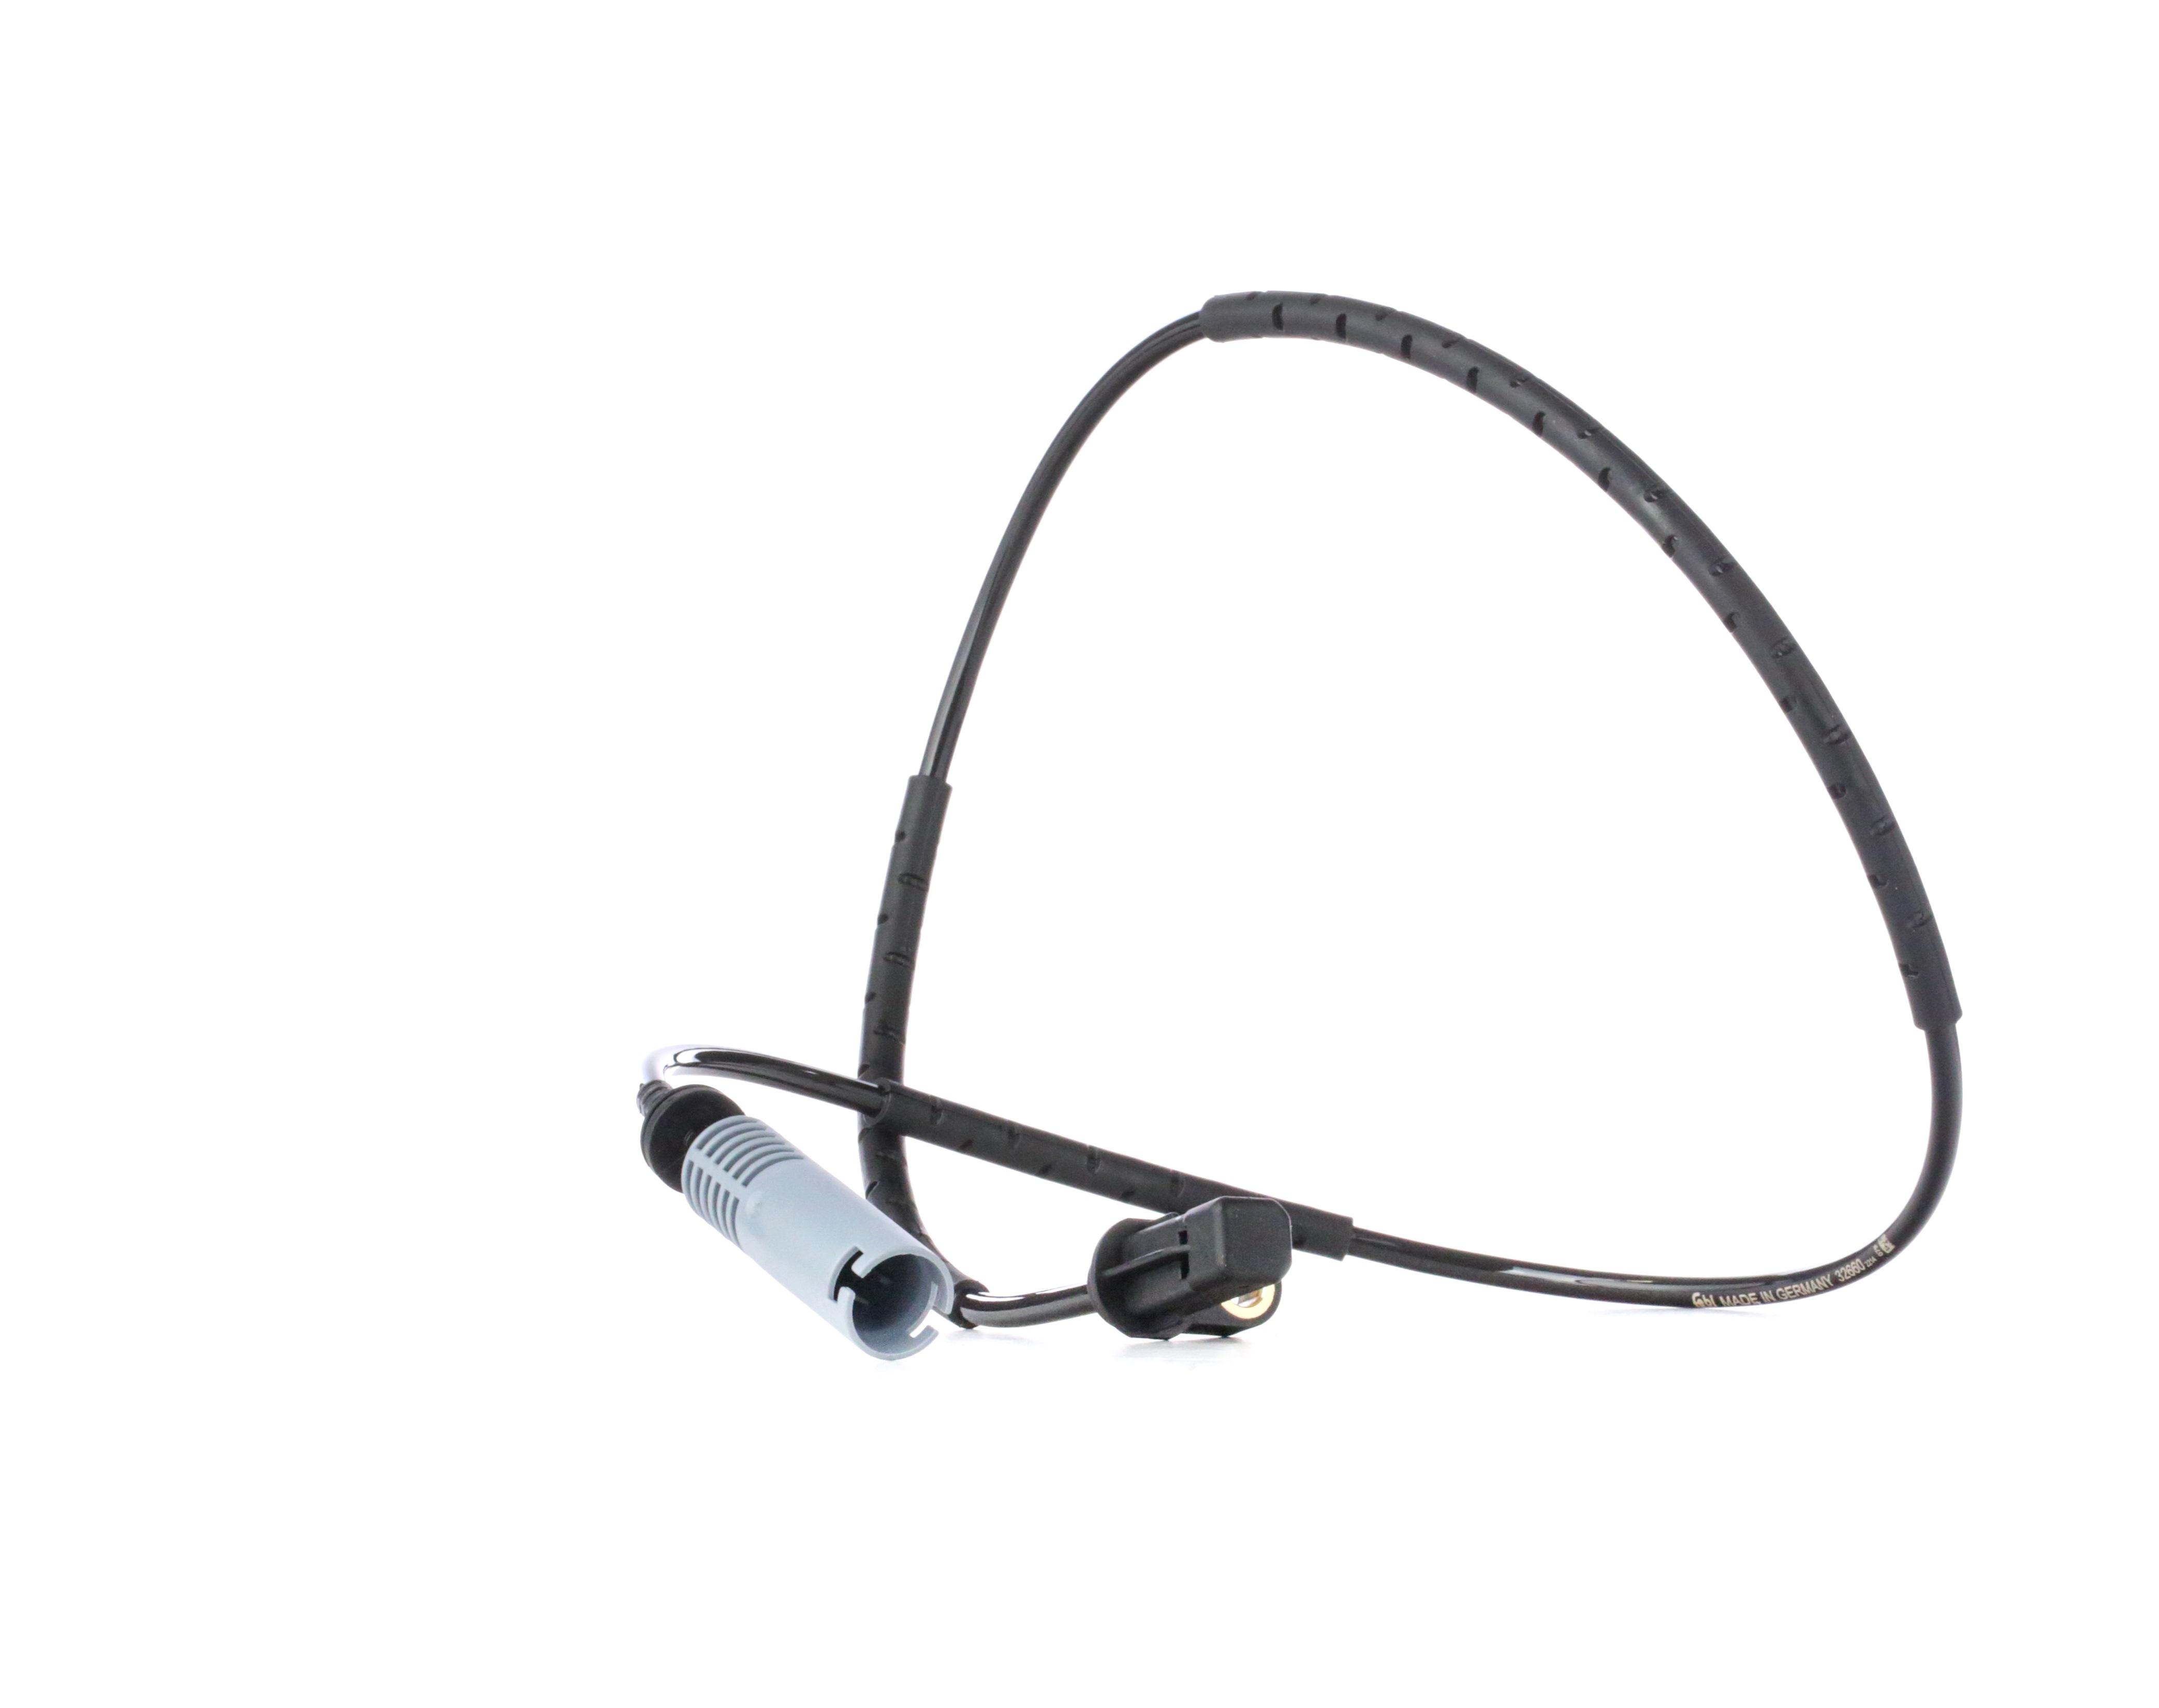 Image of FEBI BILSTEIN ABS Sensor BMW 32660 34526762466 ESP Sensor,Sensor, wheel speed